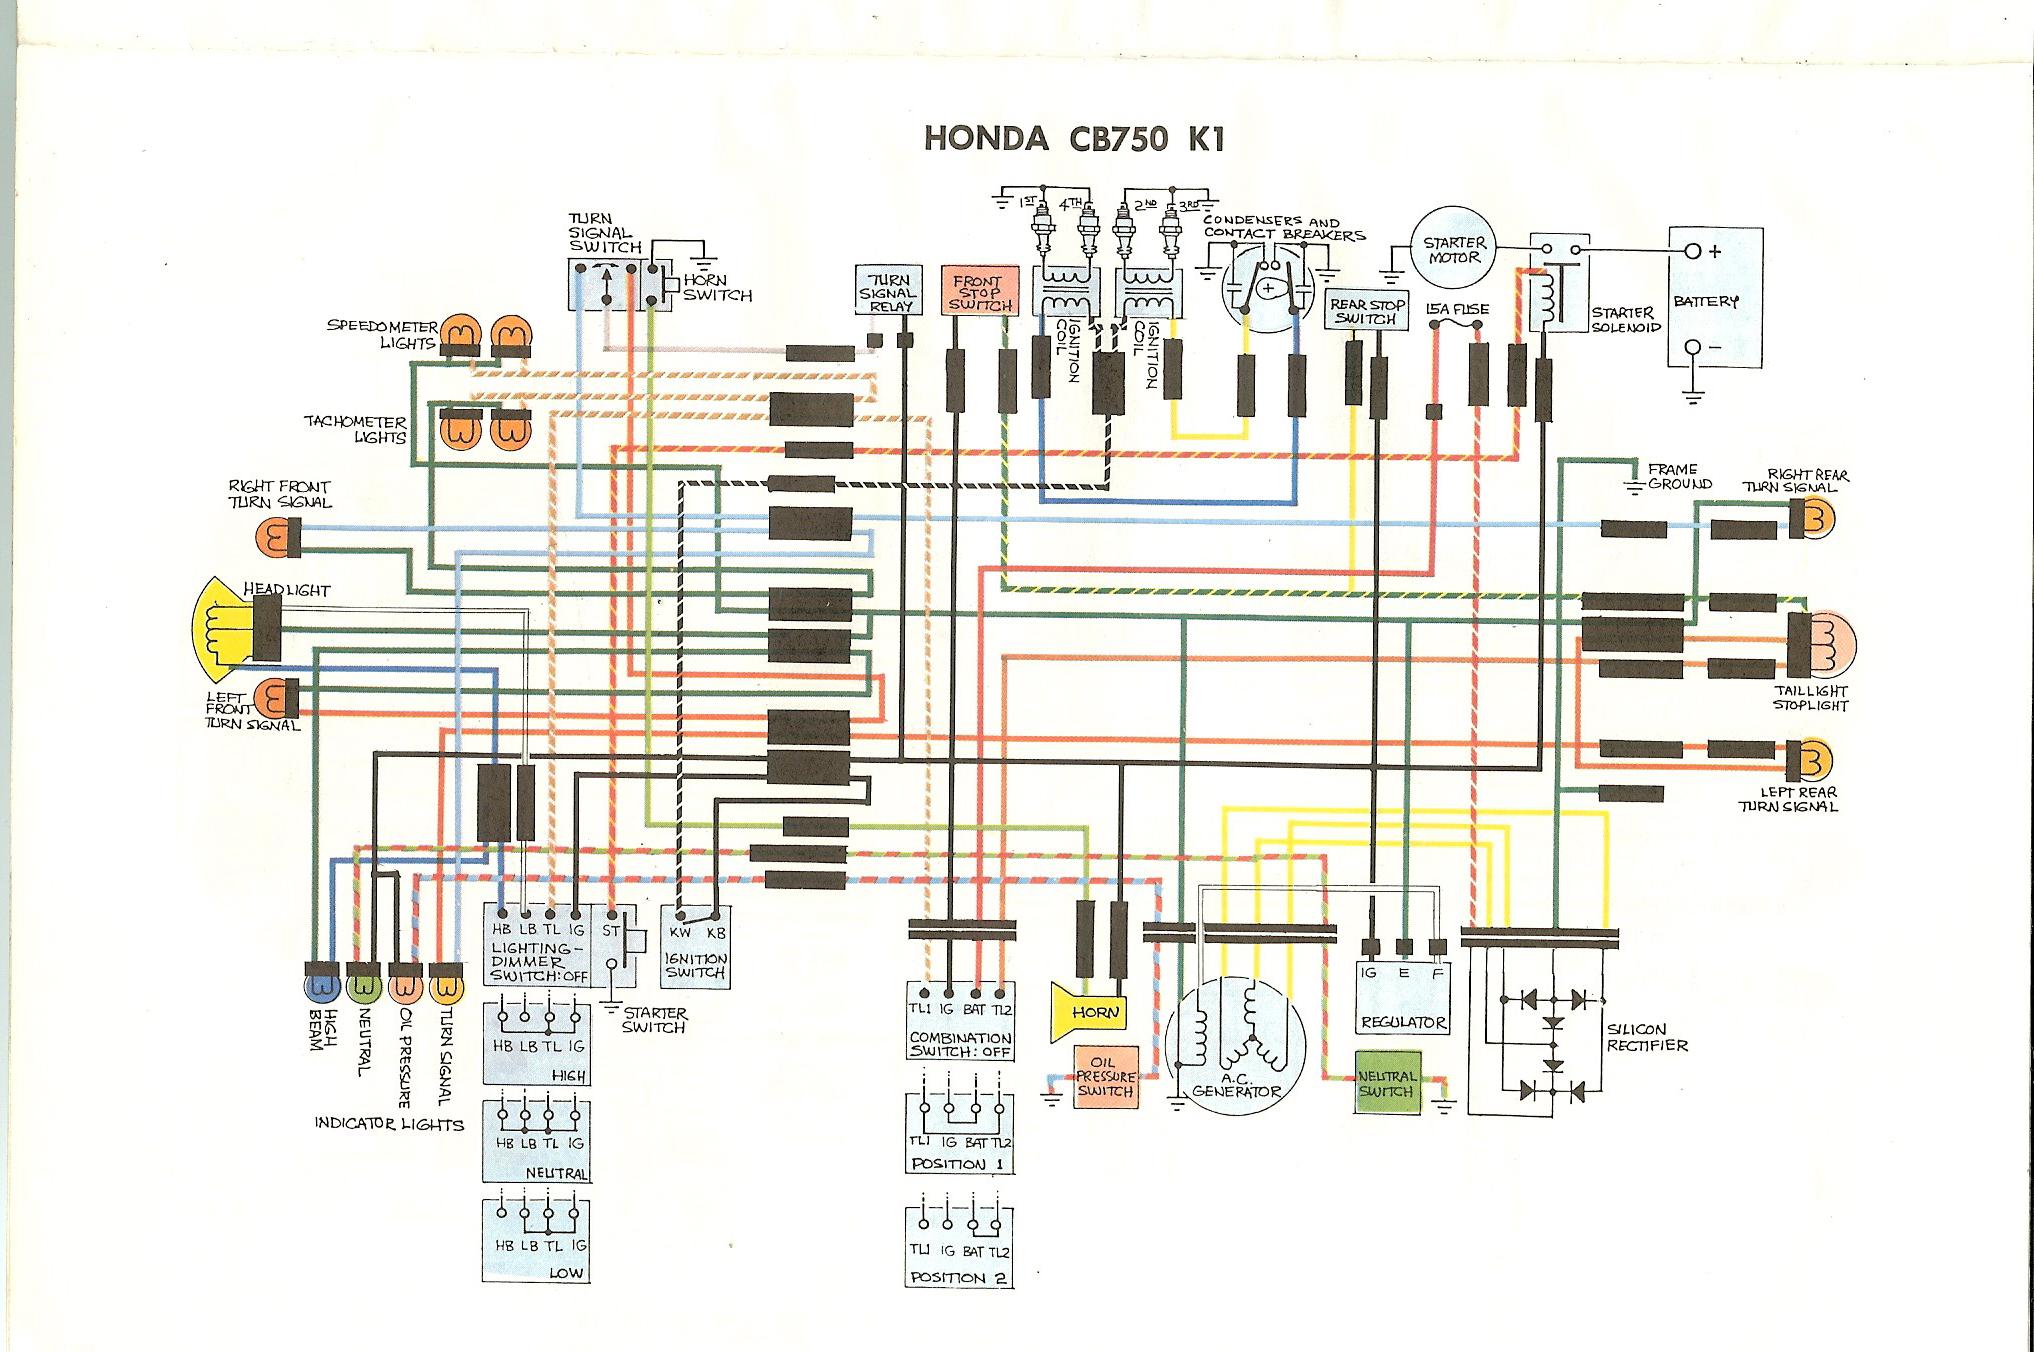 Honda Jx110 Wiring Diagram